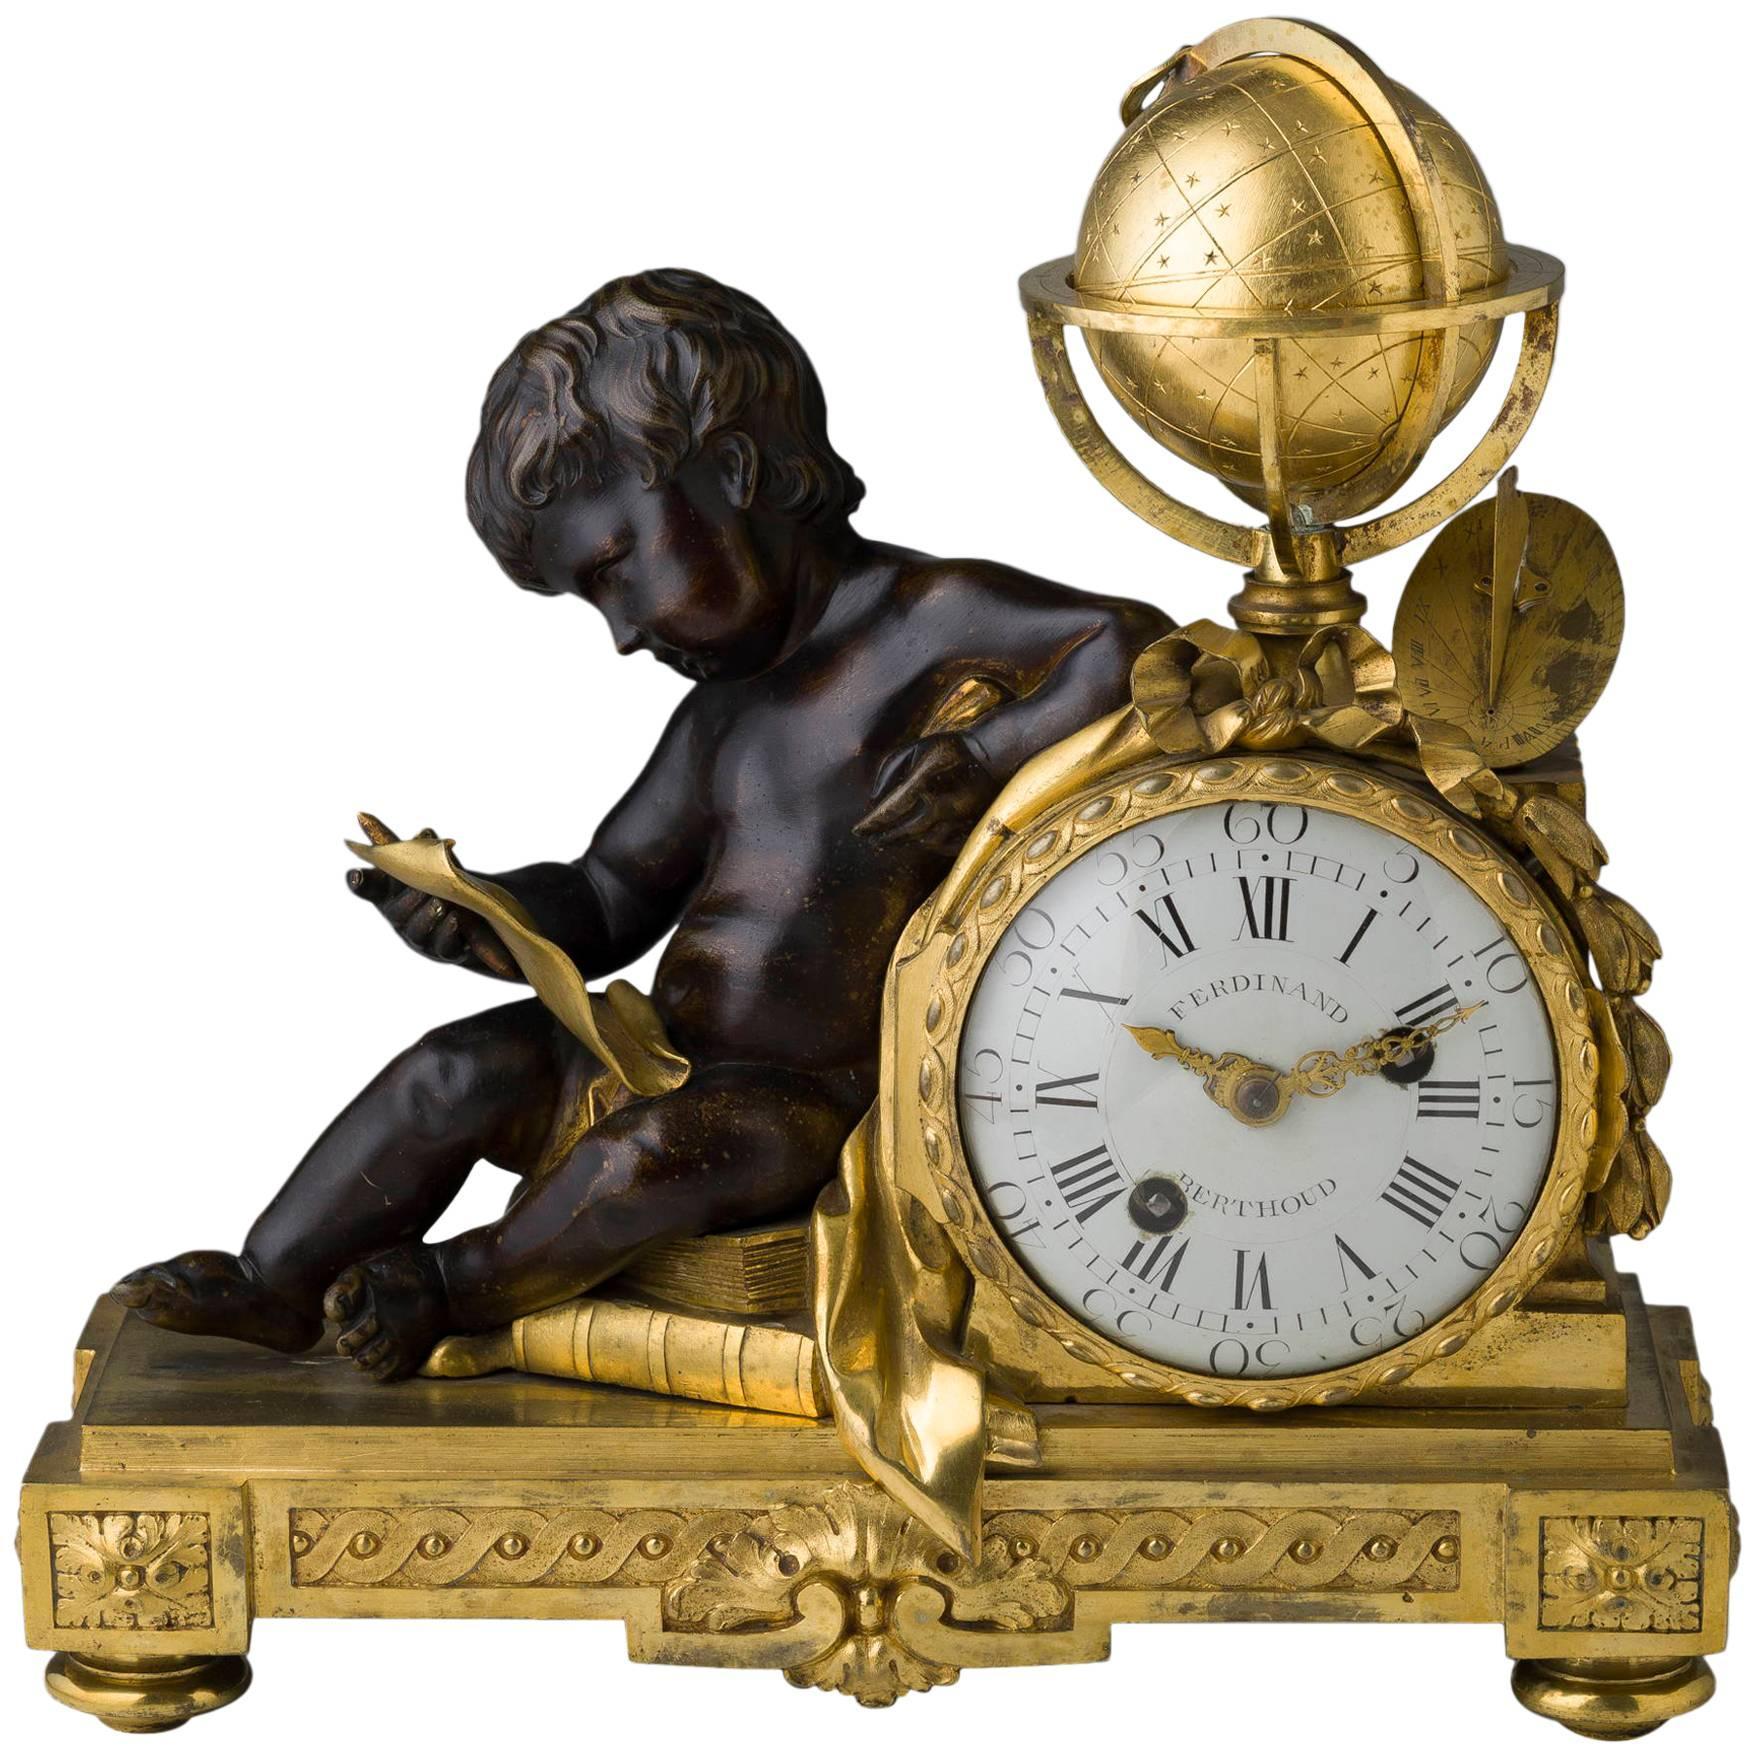 Rare Louis XVI Gilt and Patinated Bronze Mantle Clock Signed Ferdinand Berthoud